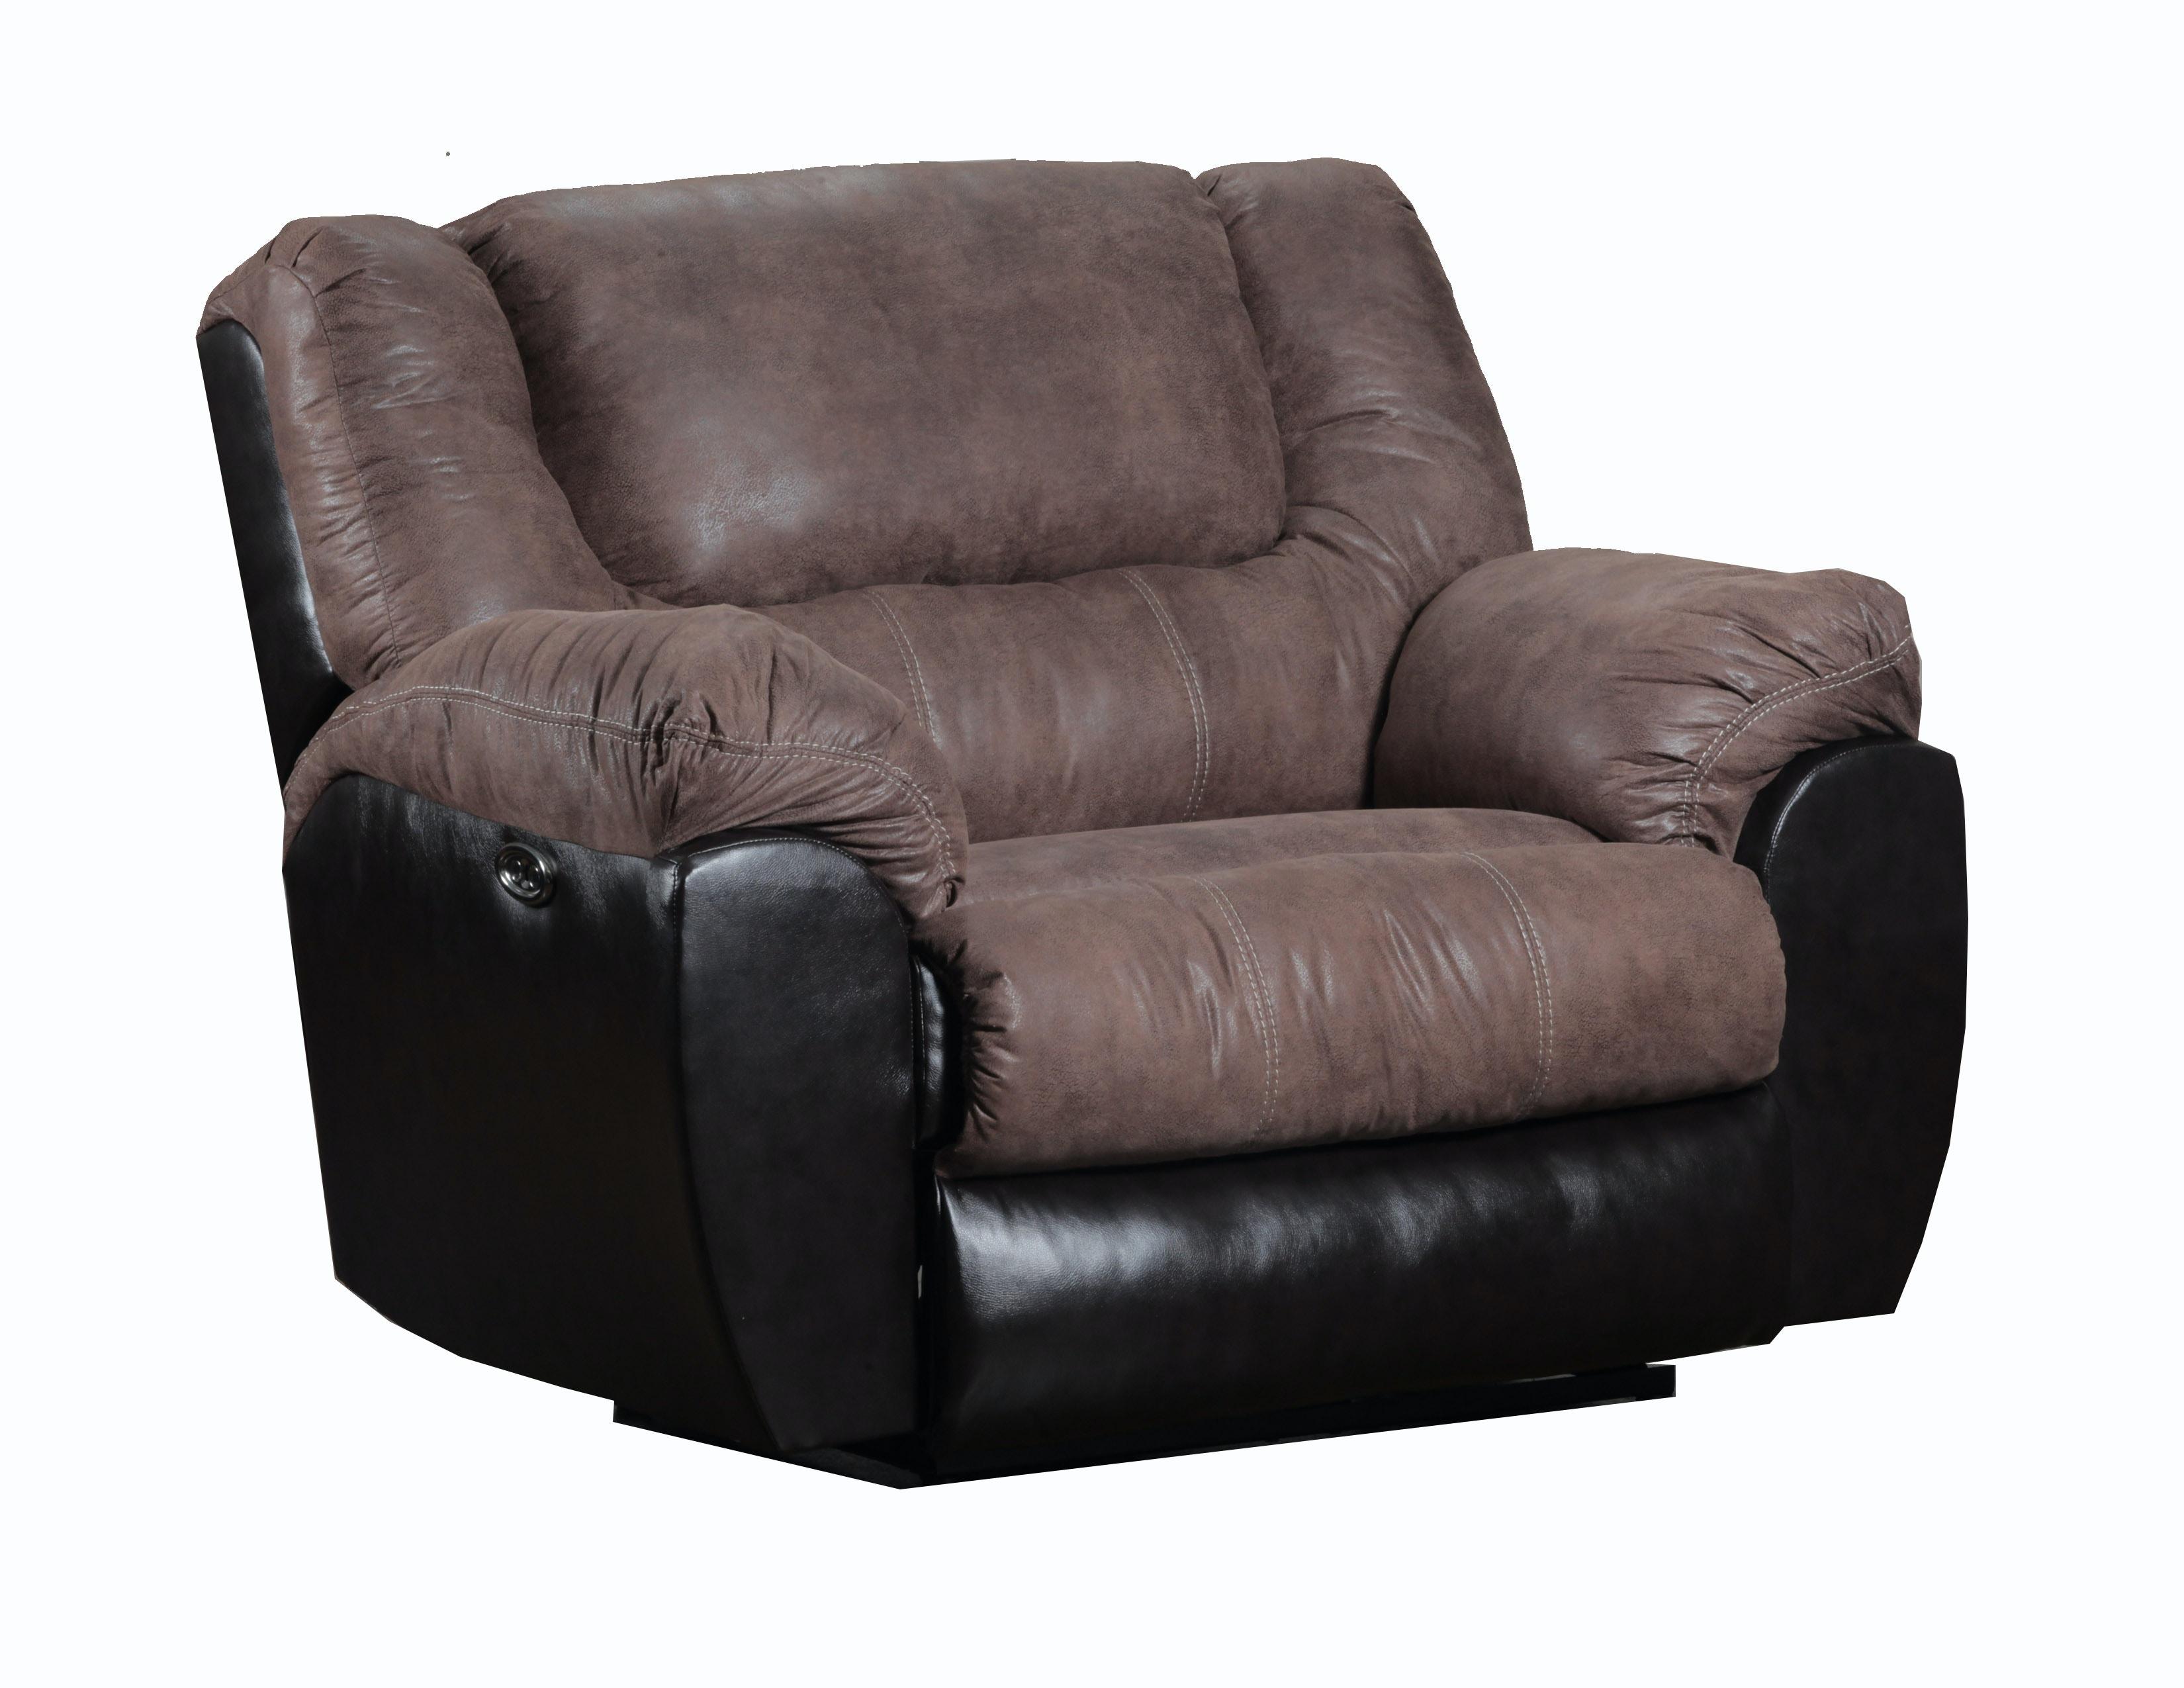 Simmons Upholstery u0026 Casegoods 50431-BR-Cuddler Recliner  sc 1 st  Davis Furniture & Simmons Upholstery u0026 Casegoods Living Room 50431-BR-Cuddler Recliner ...